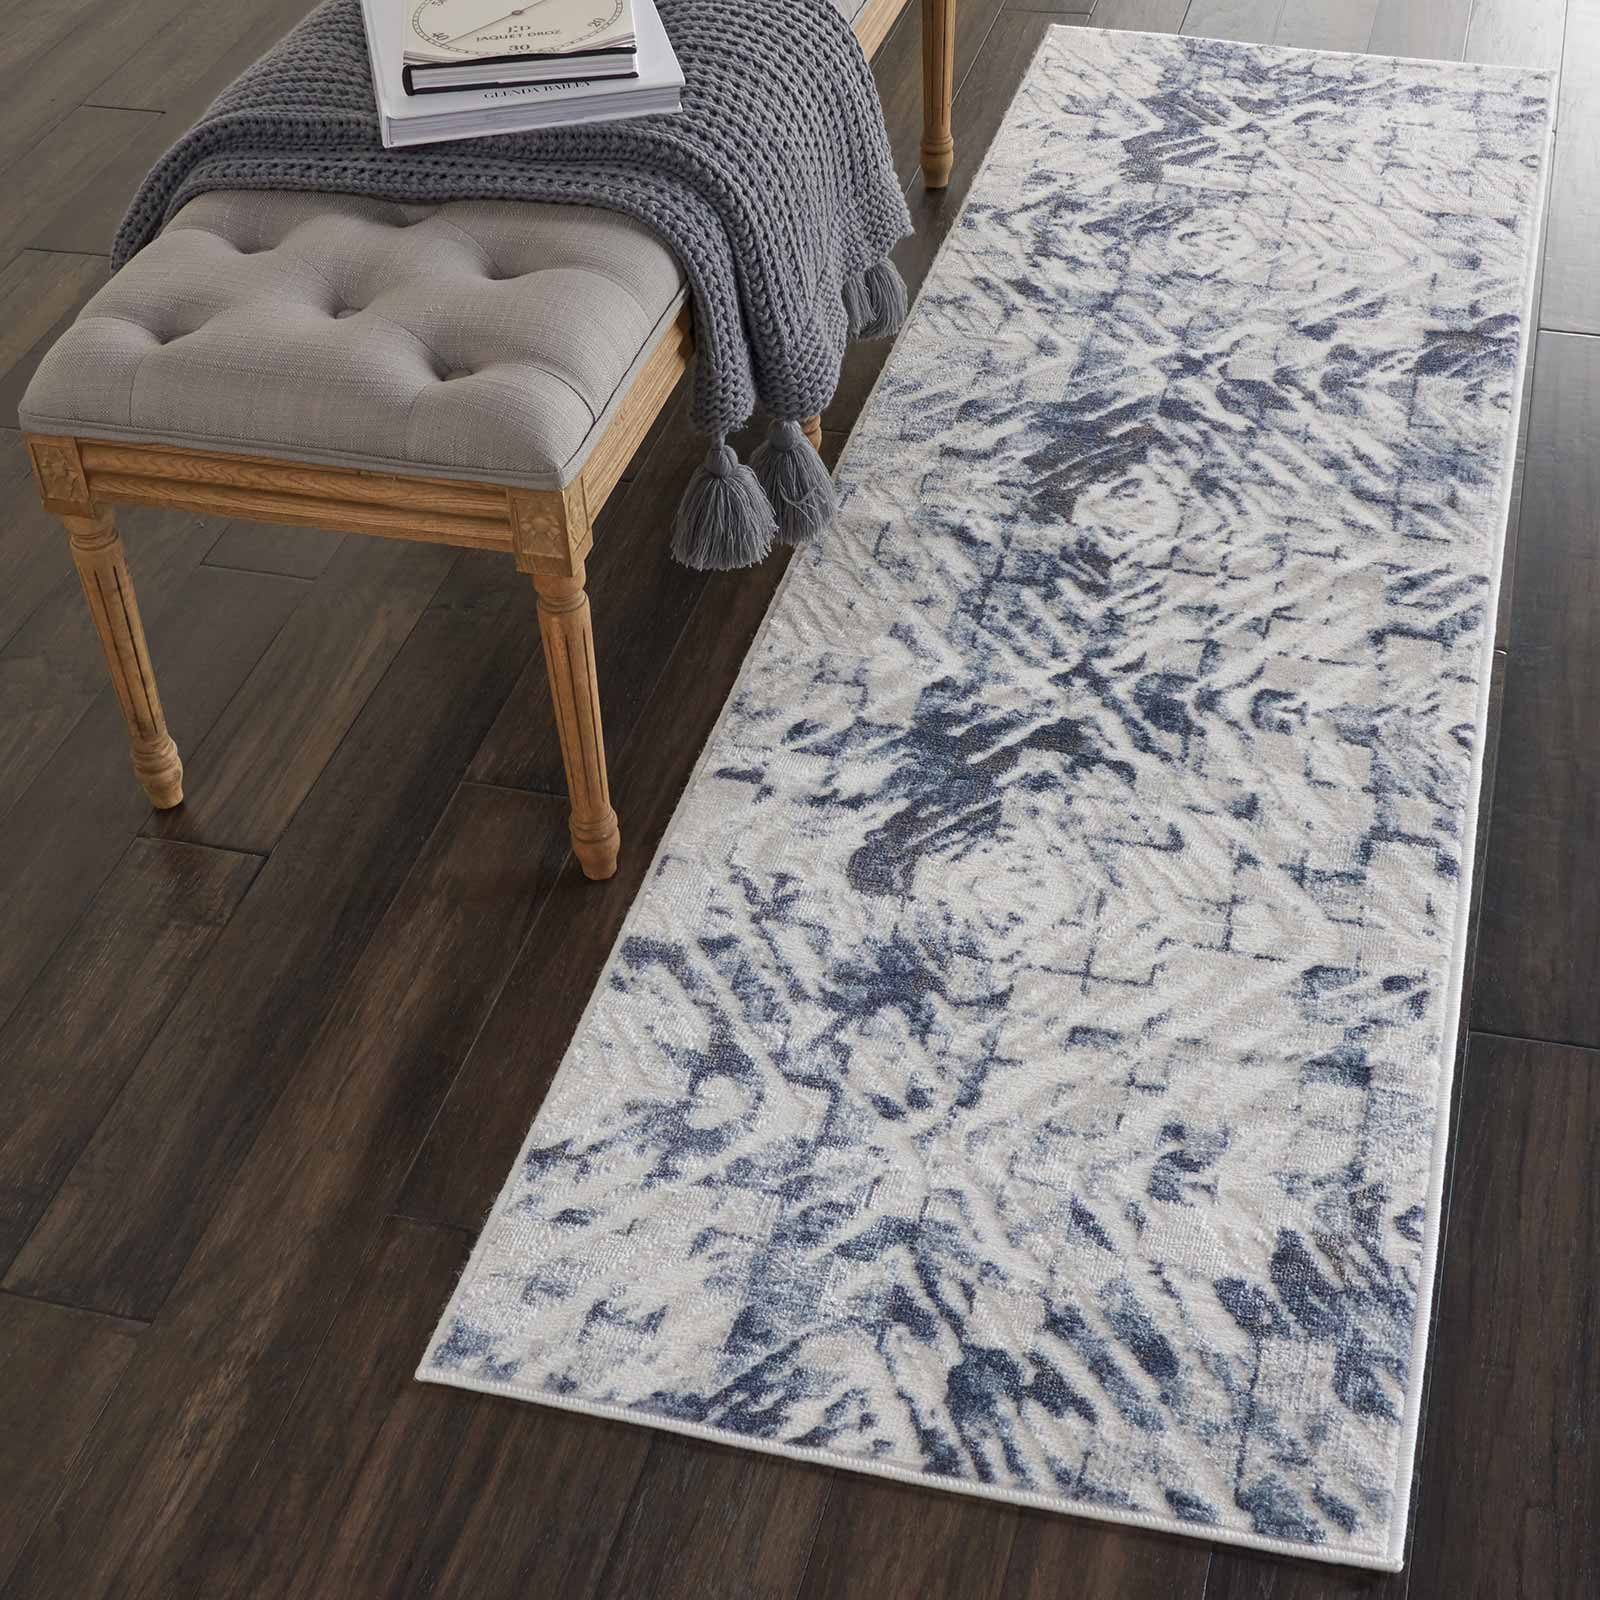 Nourison rug Urban Decor URD02 IVORY BLUE 2X8 099446466945 interior 1 C